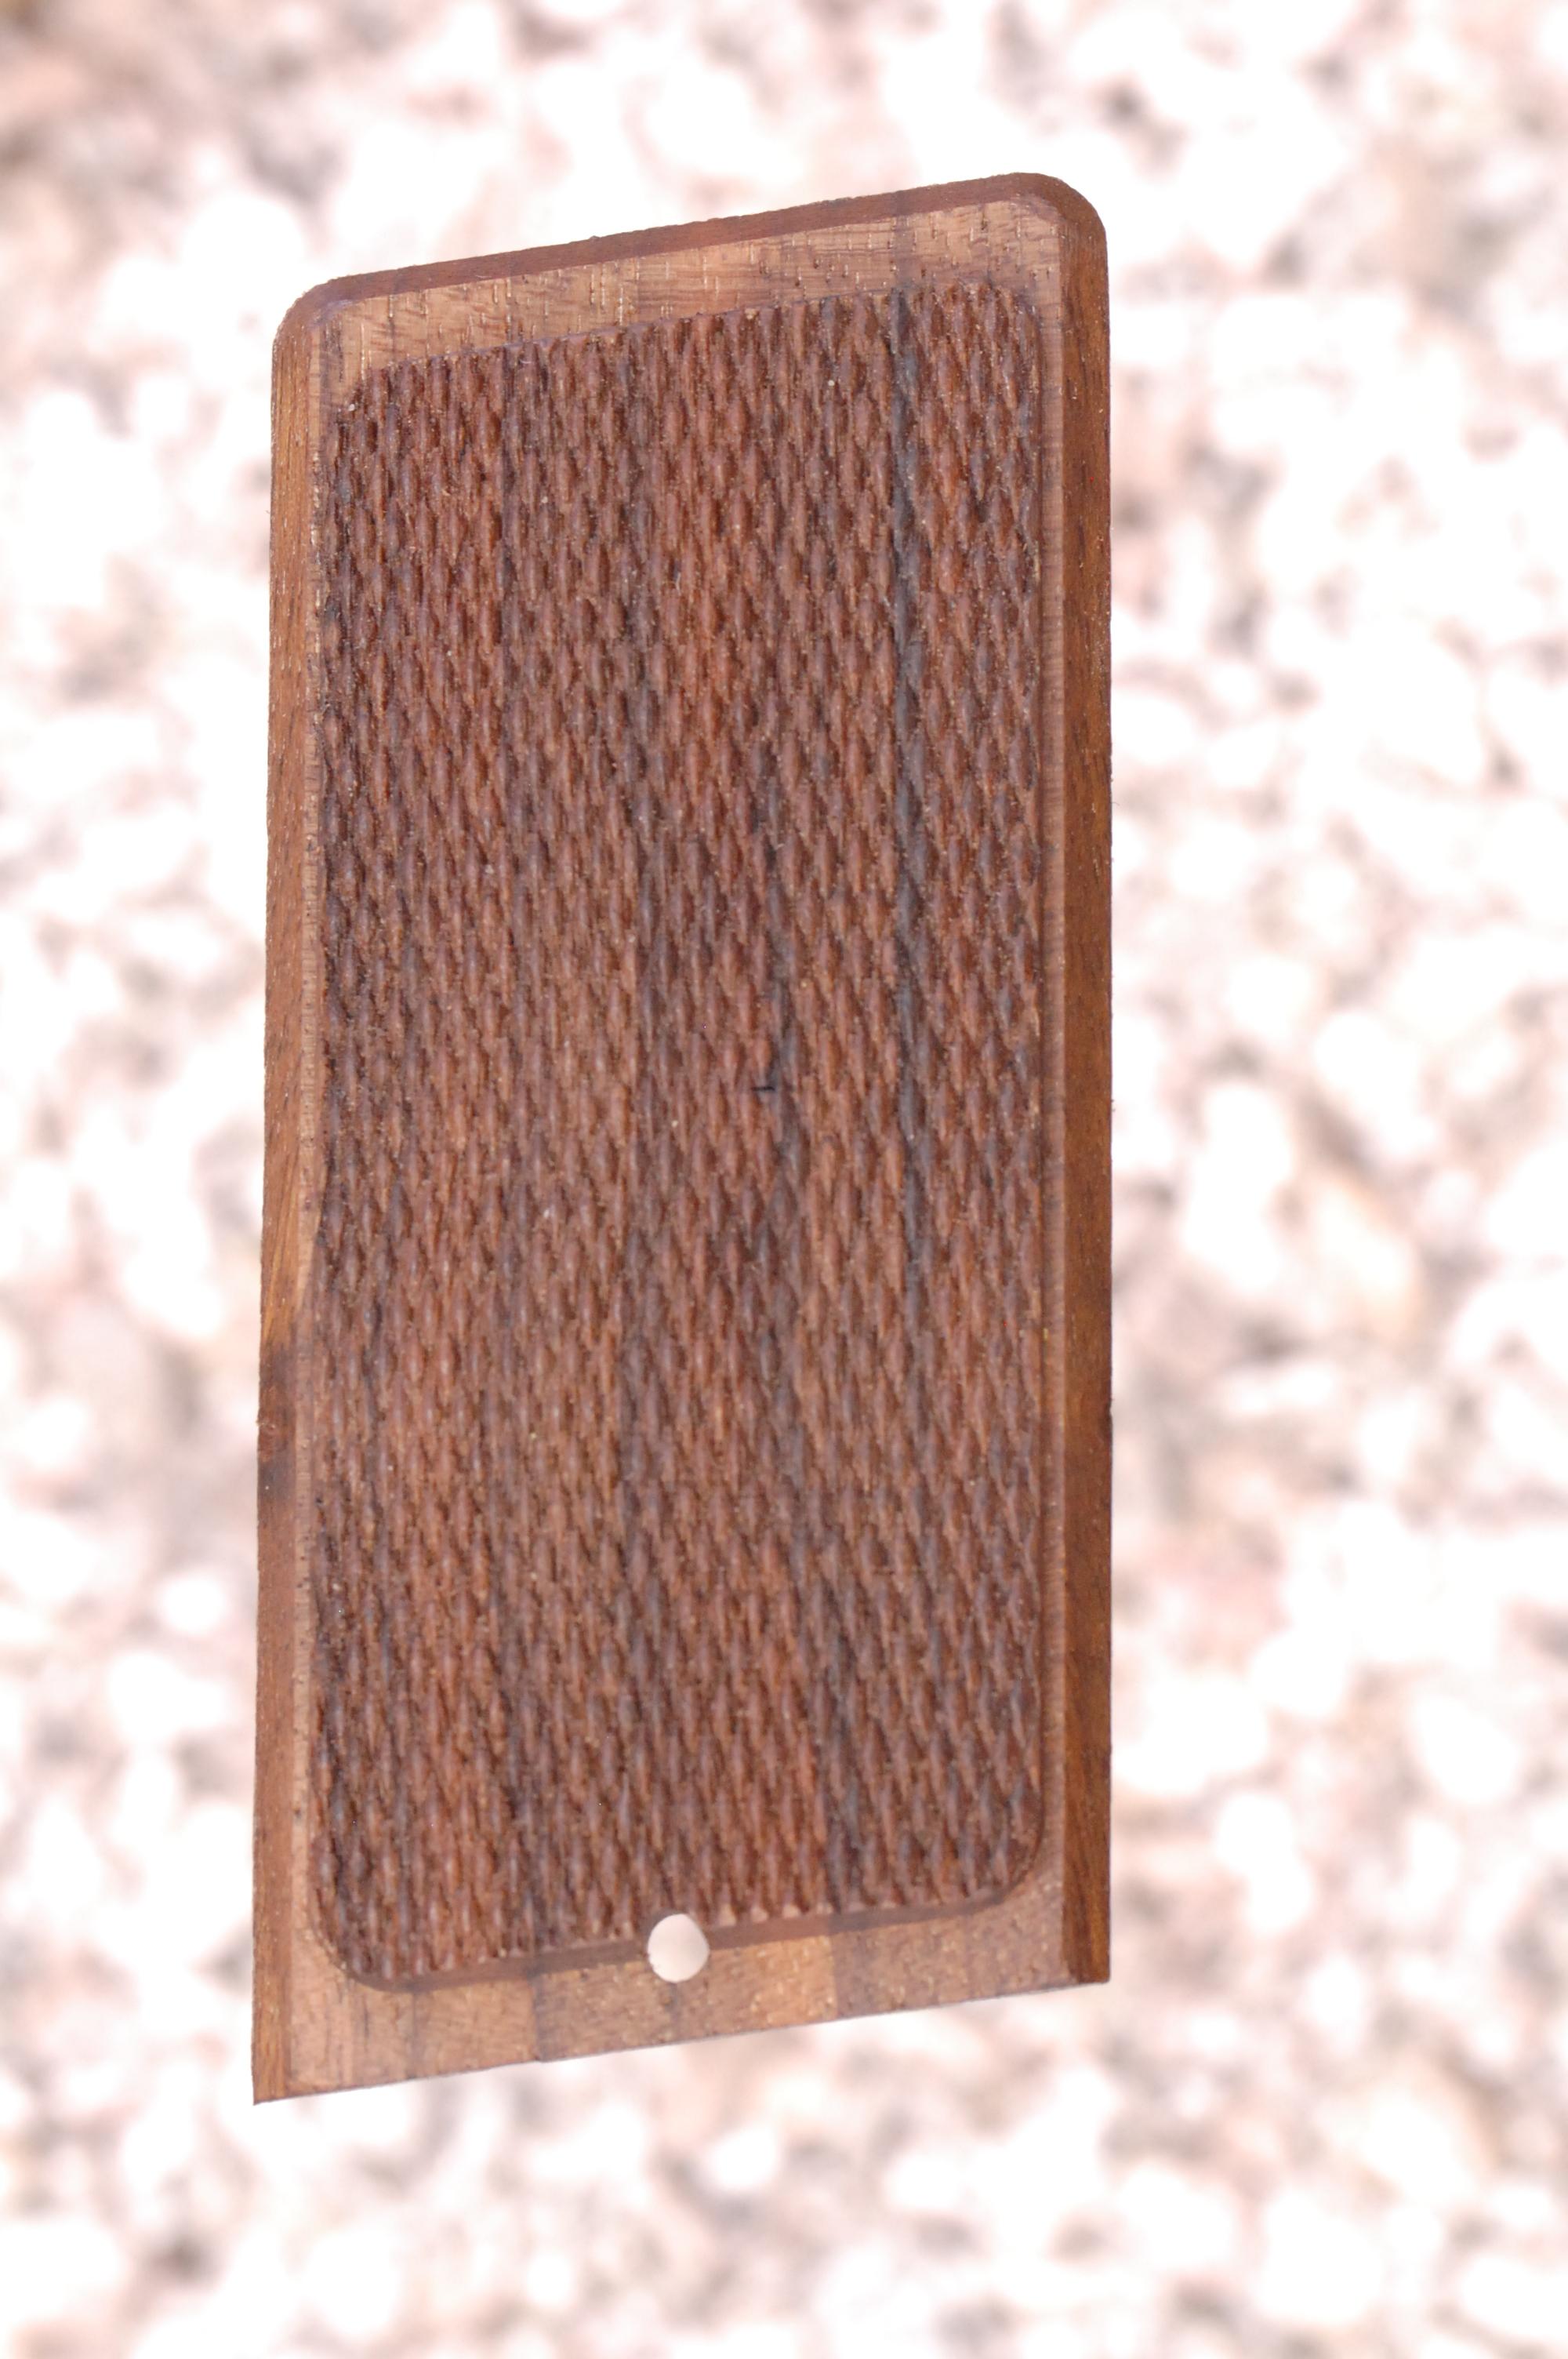 STEYER 1918 GRIPS (checkered) - full size